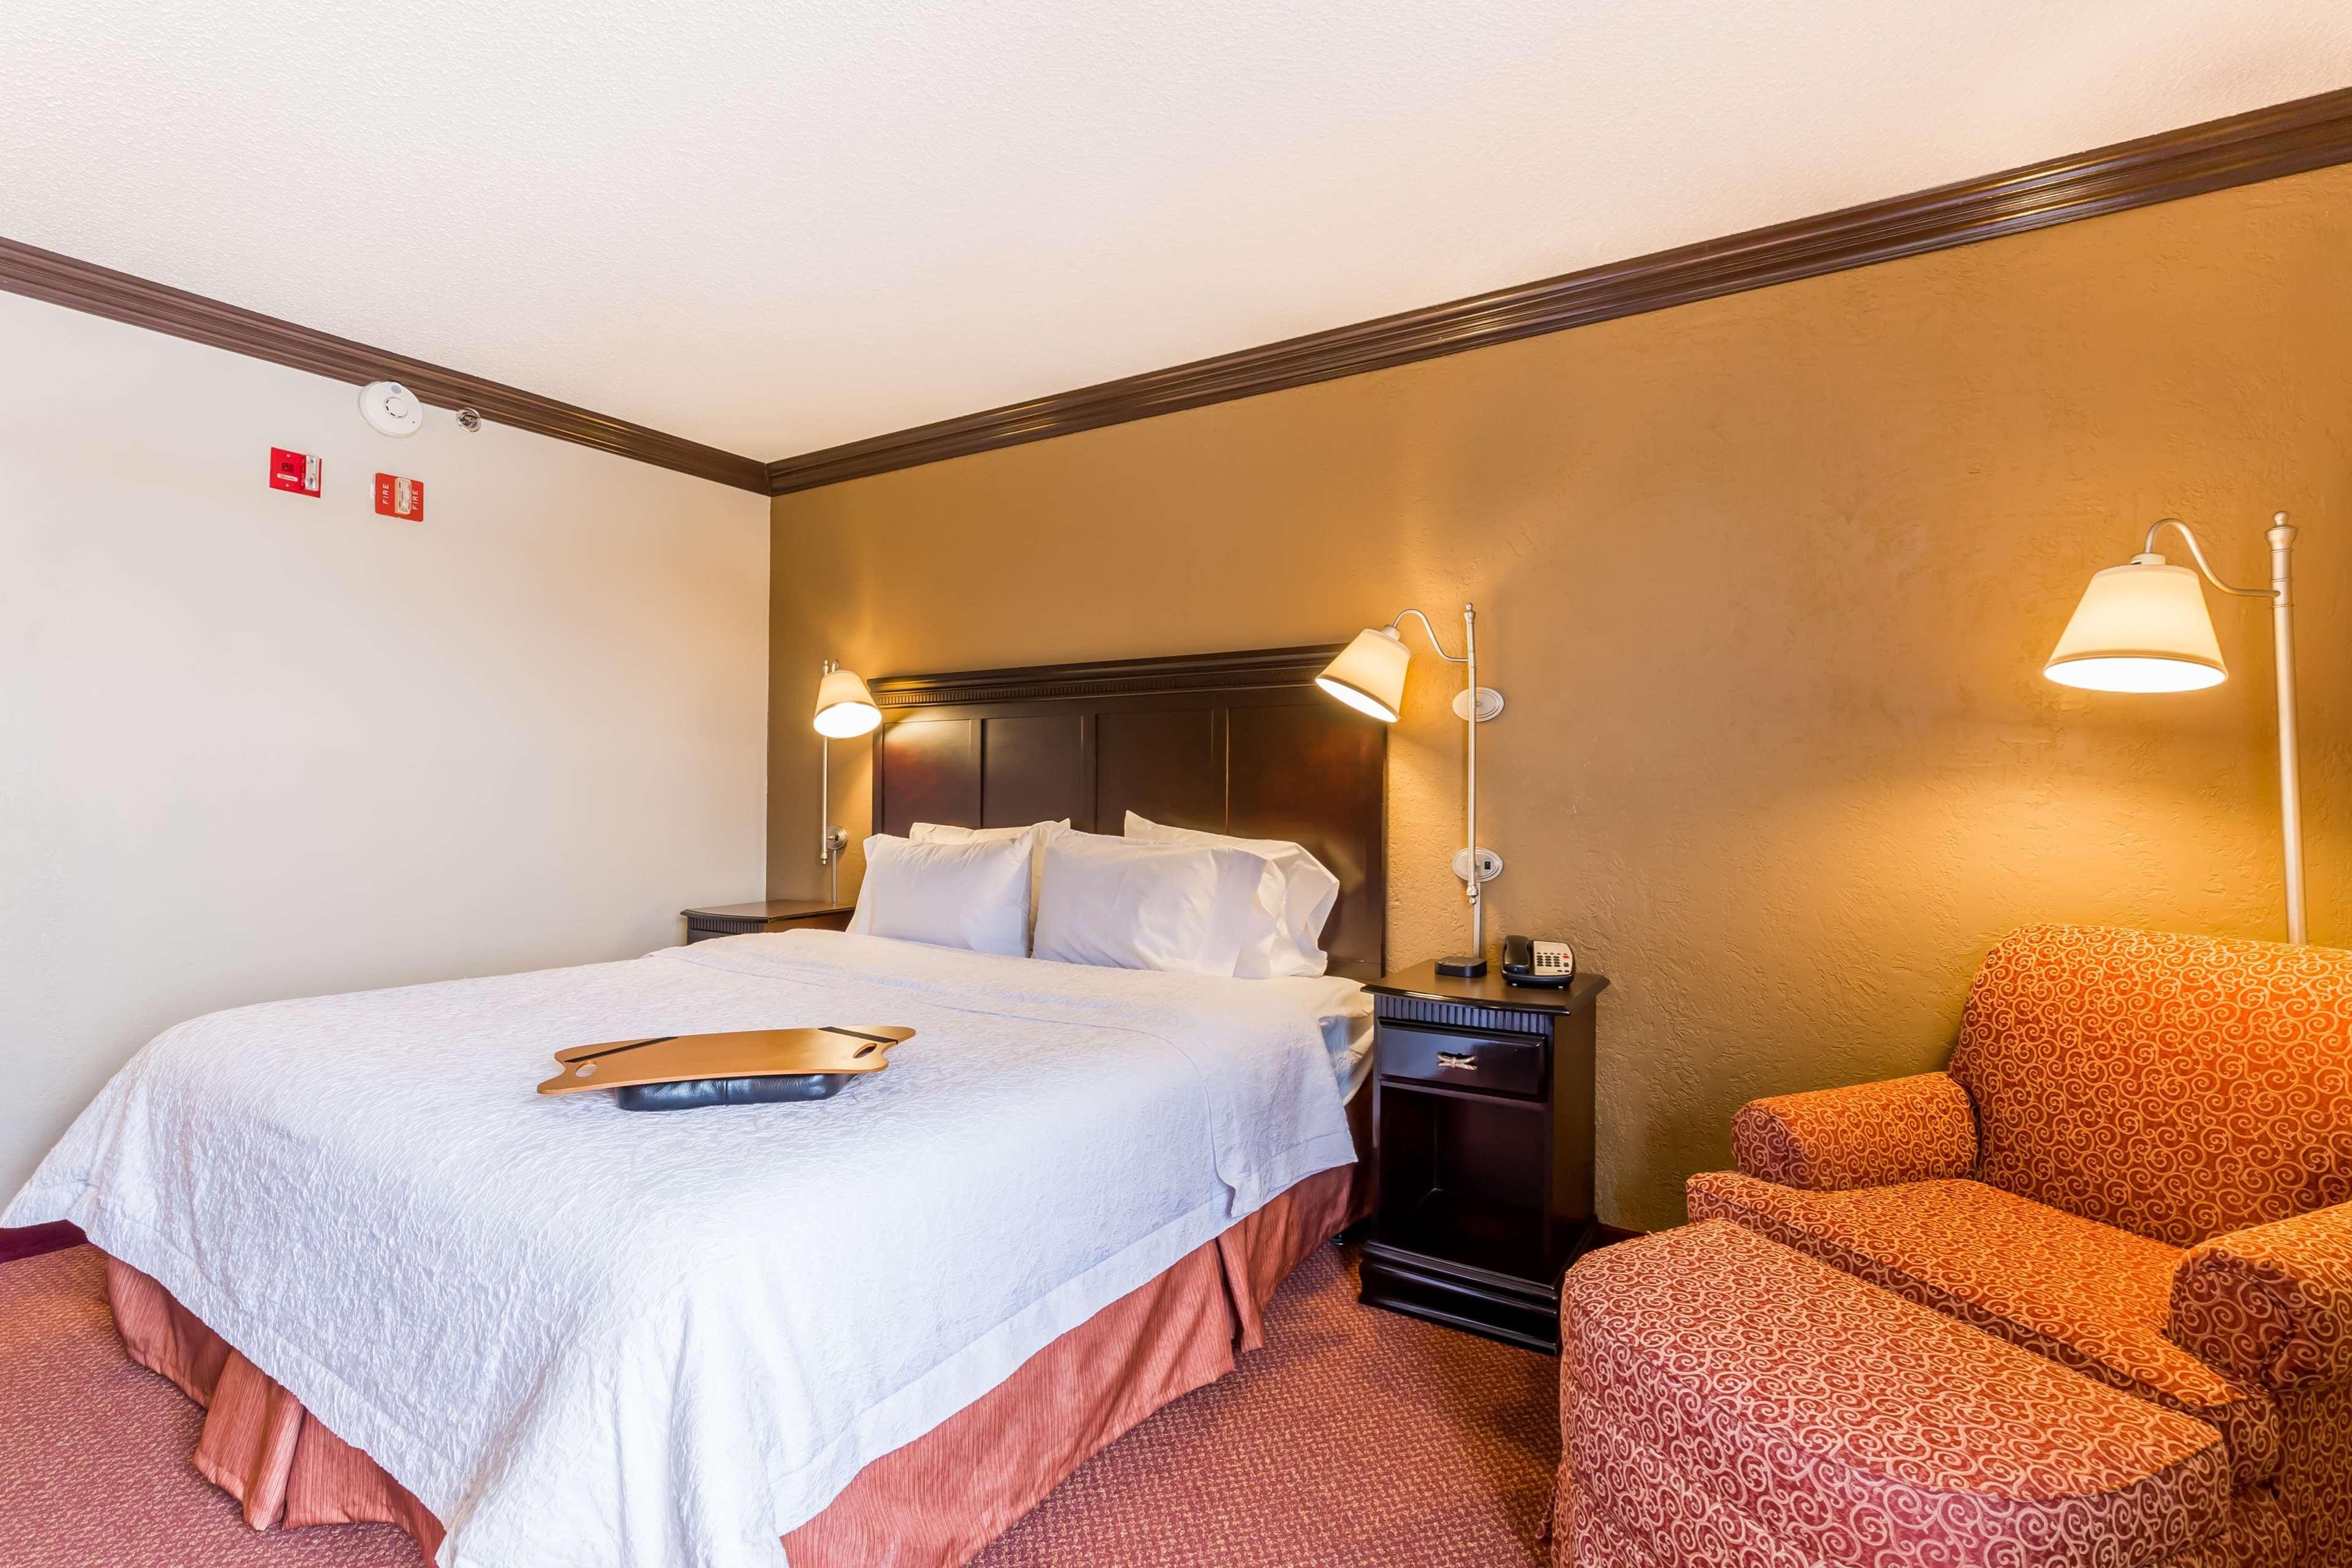 Hampton Inn & Suites Chicago/Hoffman Estates image 43